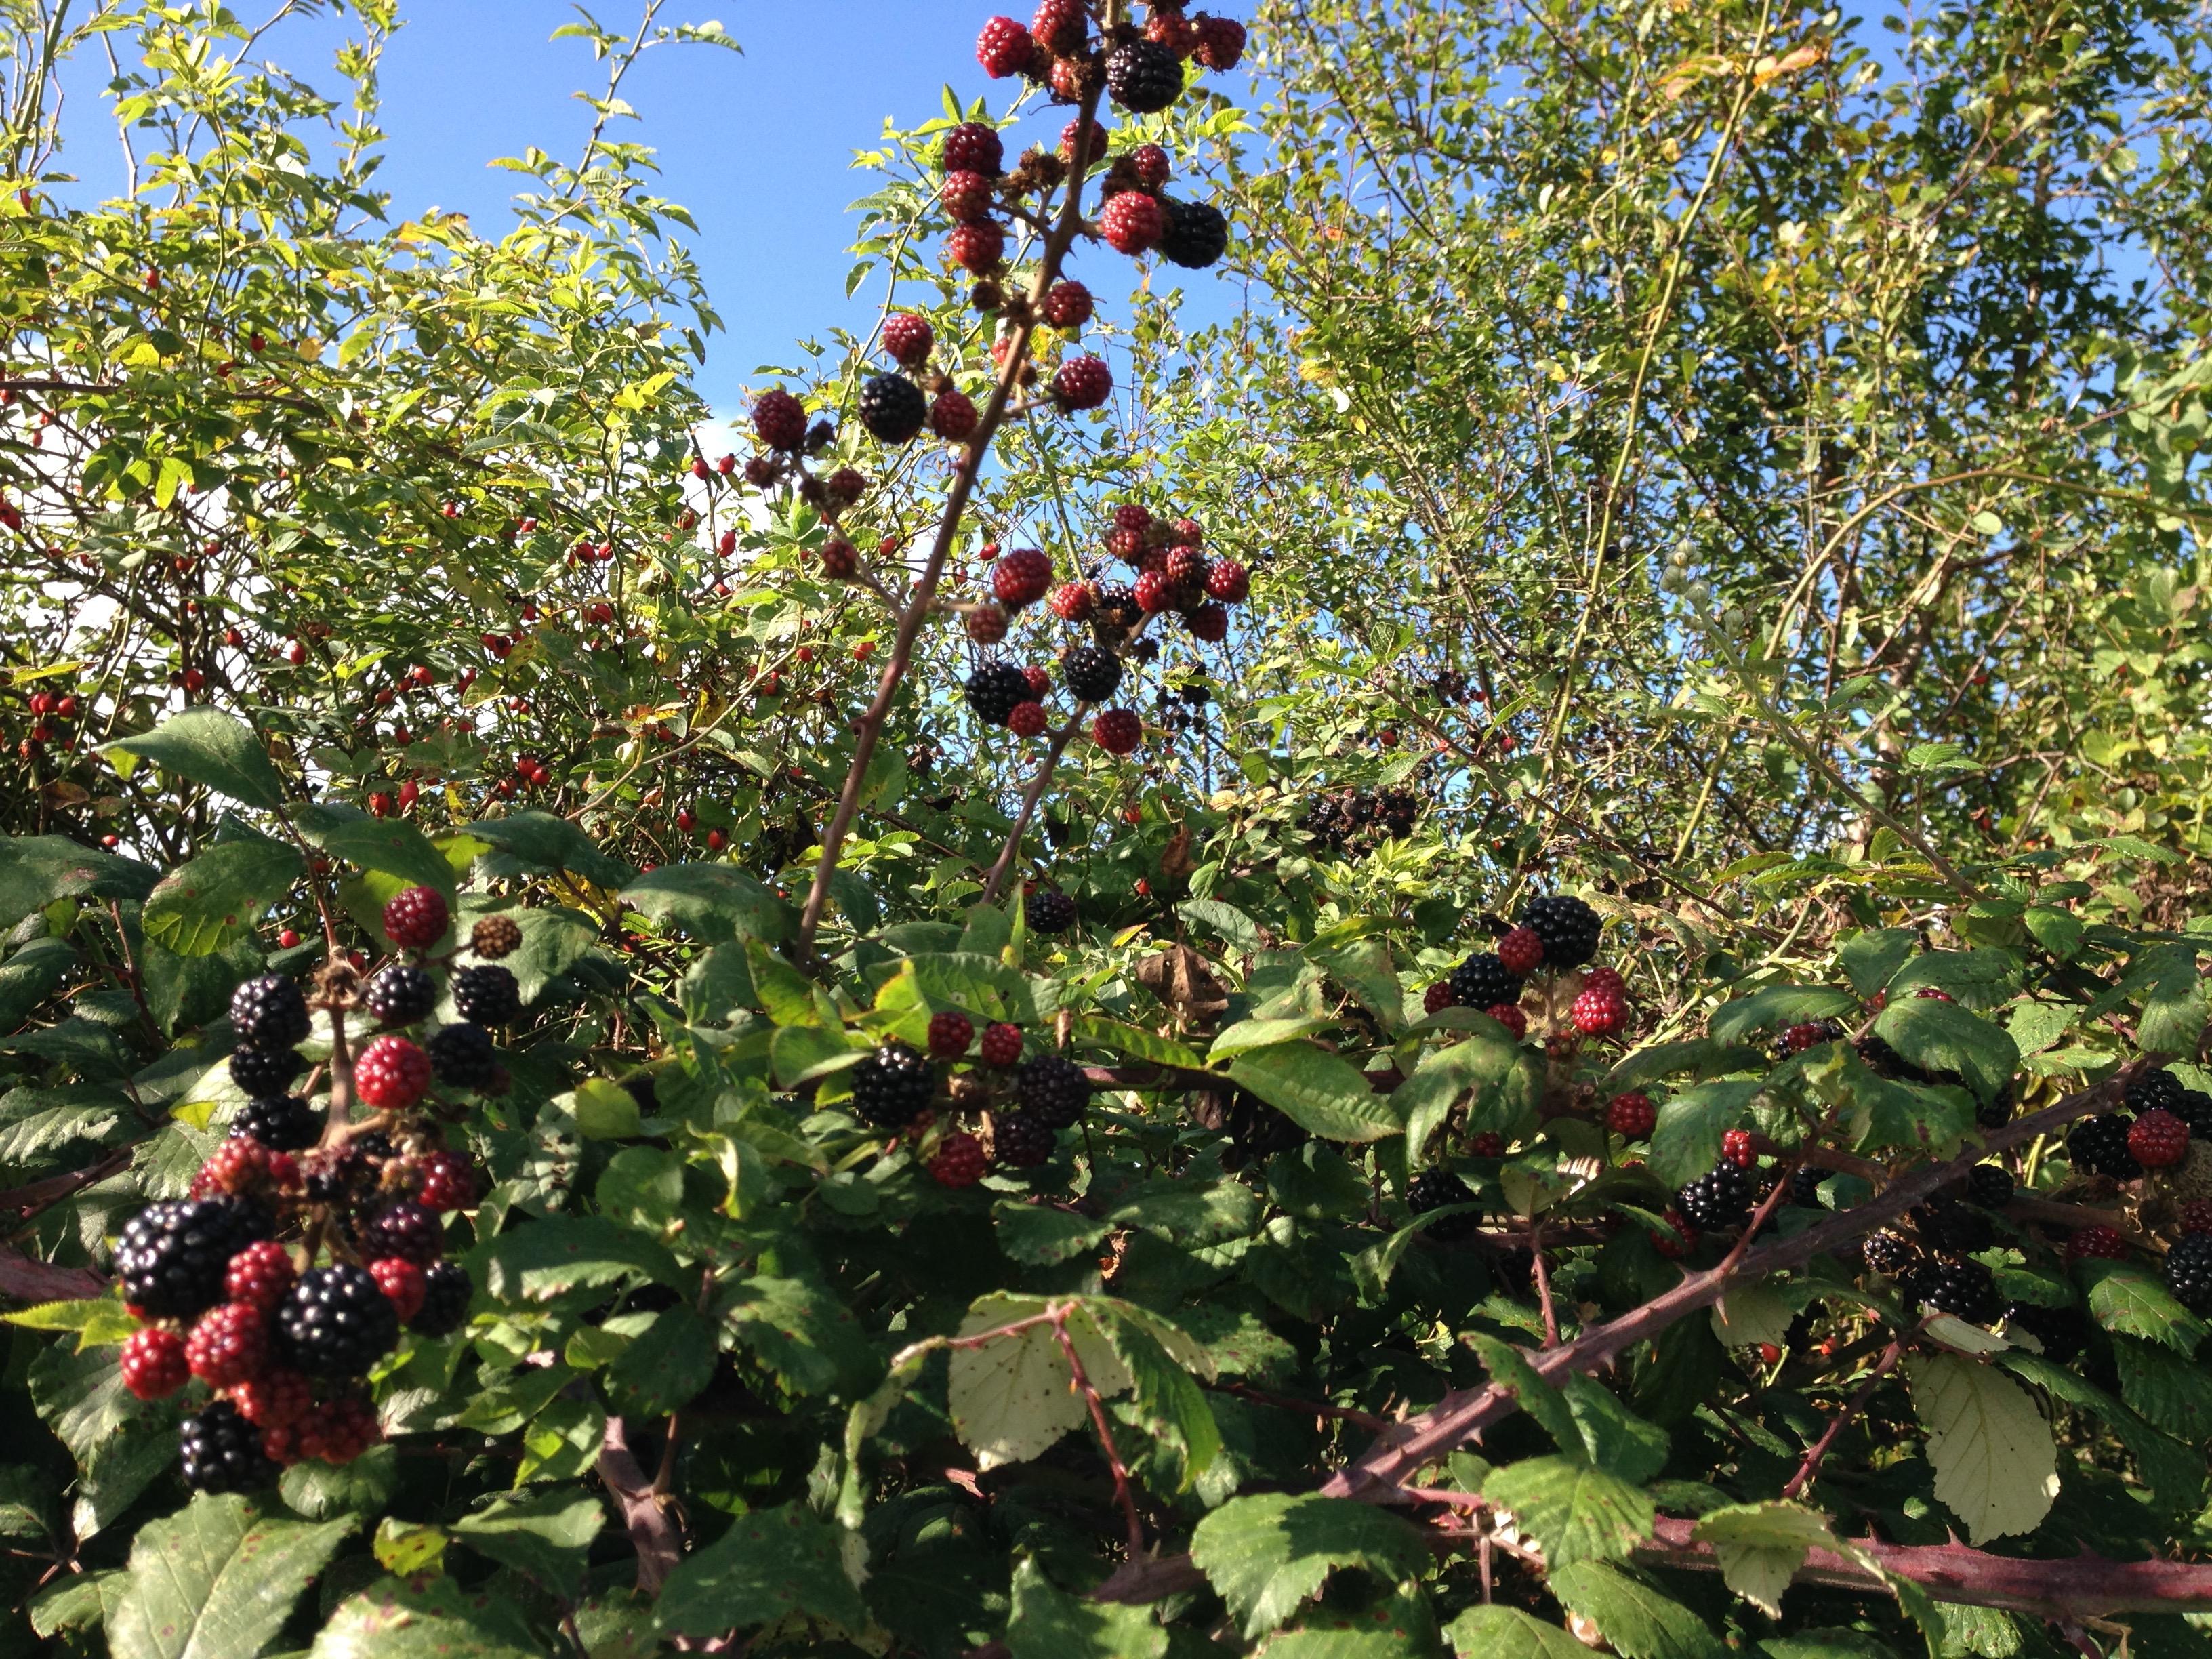 Autumn-blackberries